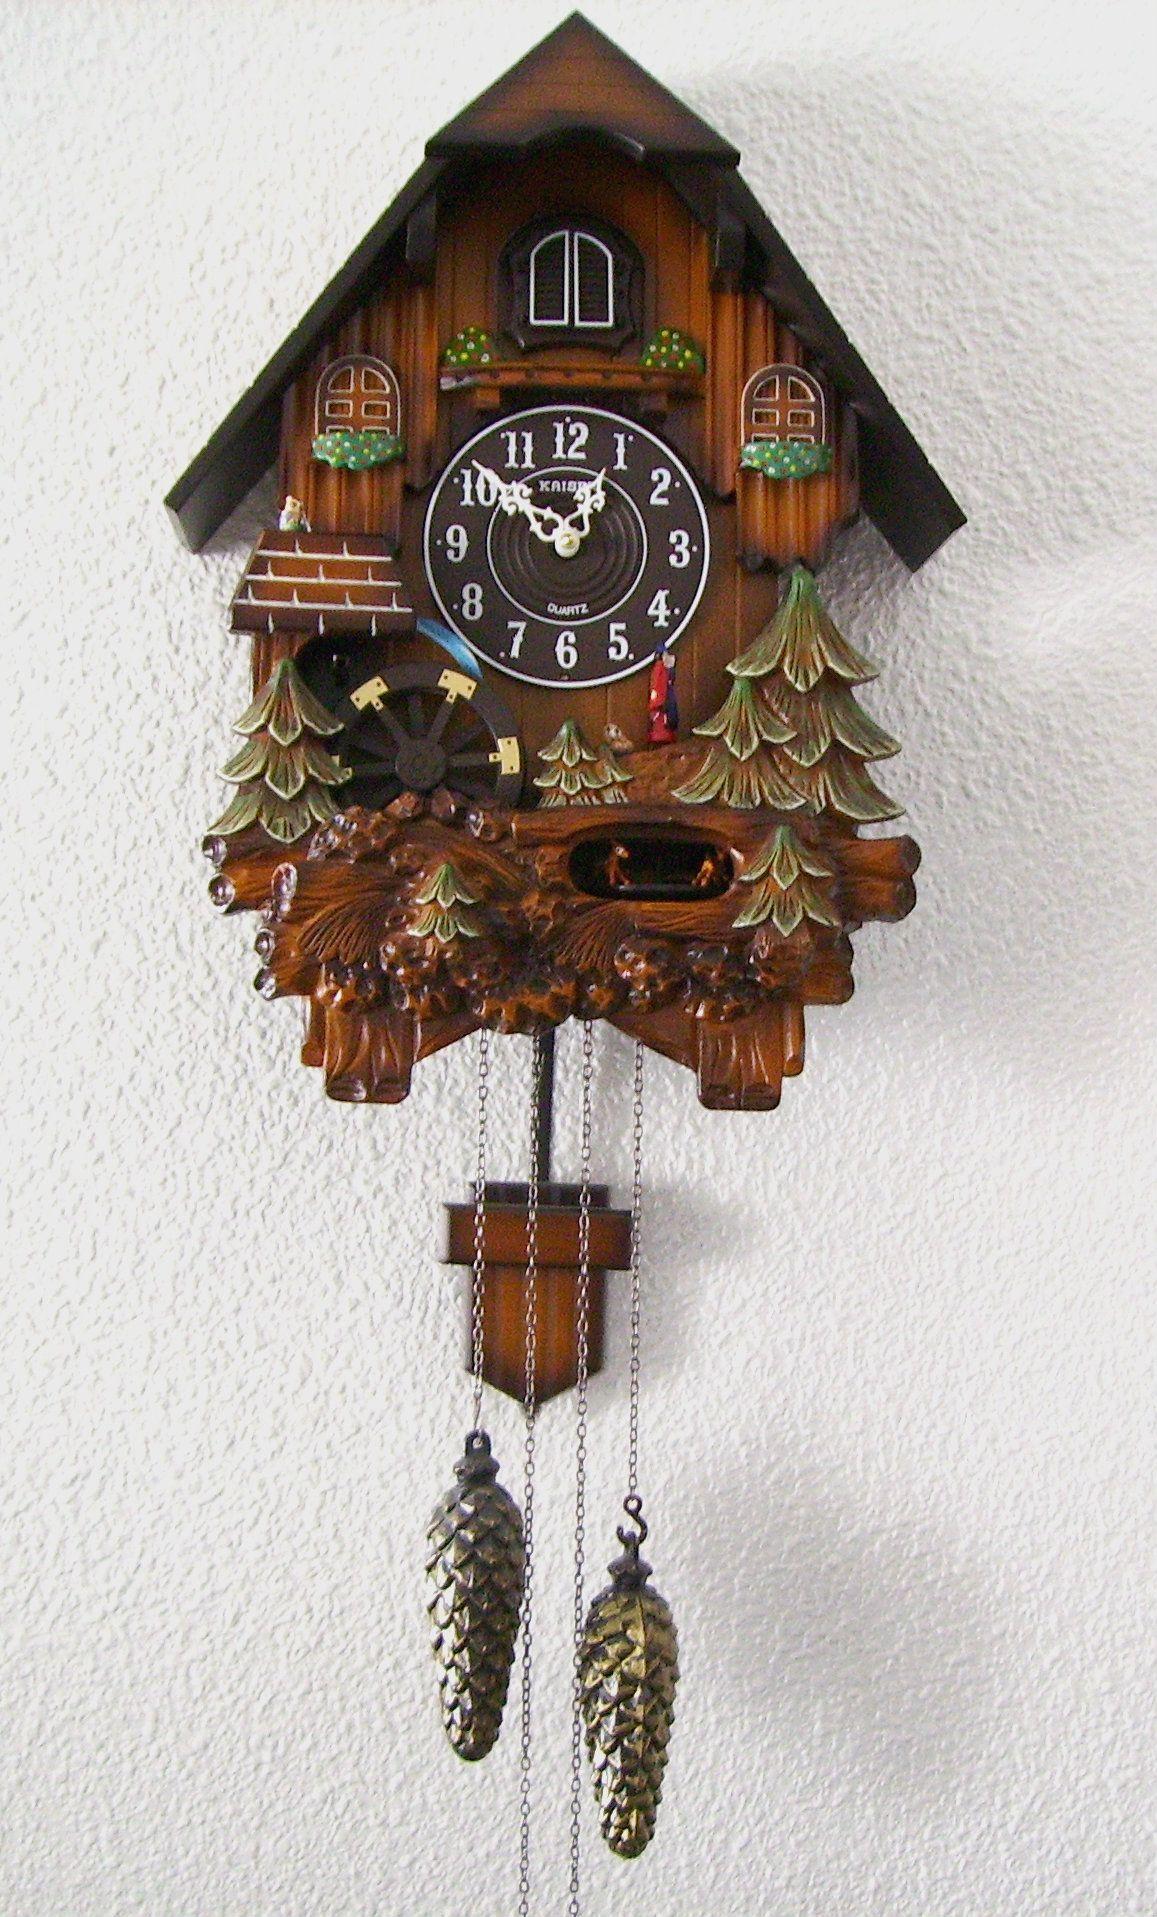 Reloj De Cuco Old Clocks Wall Clock Clock